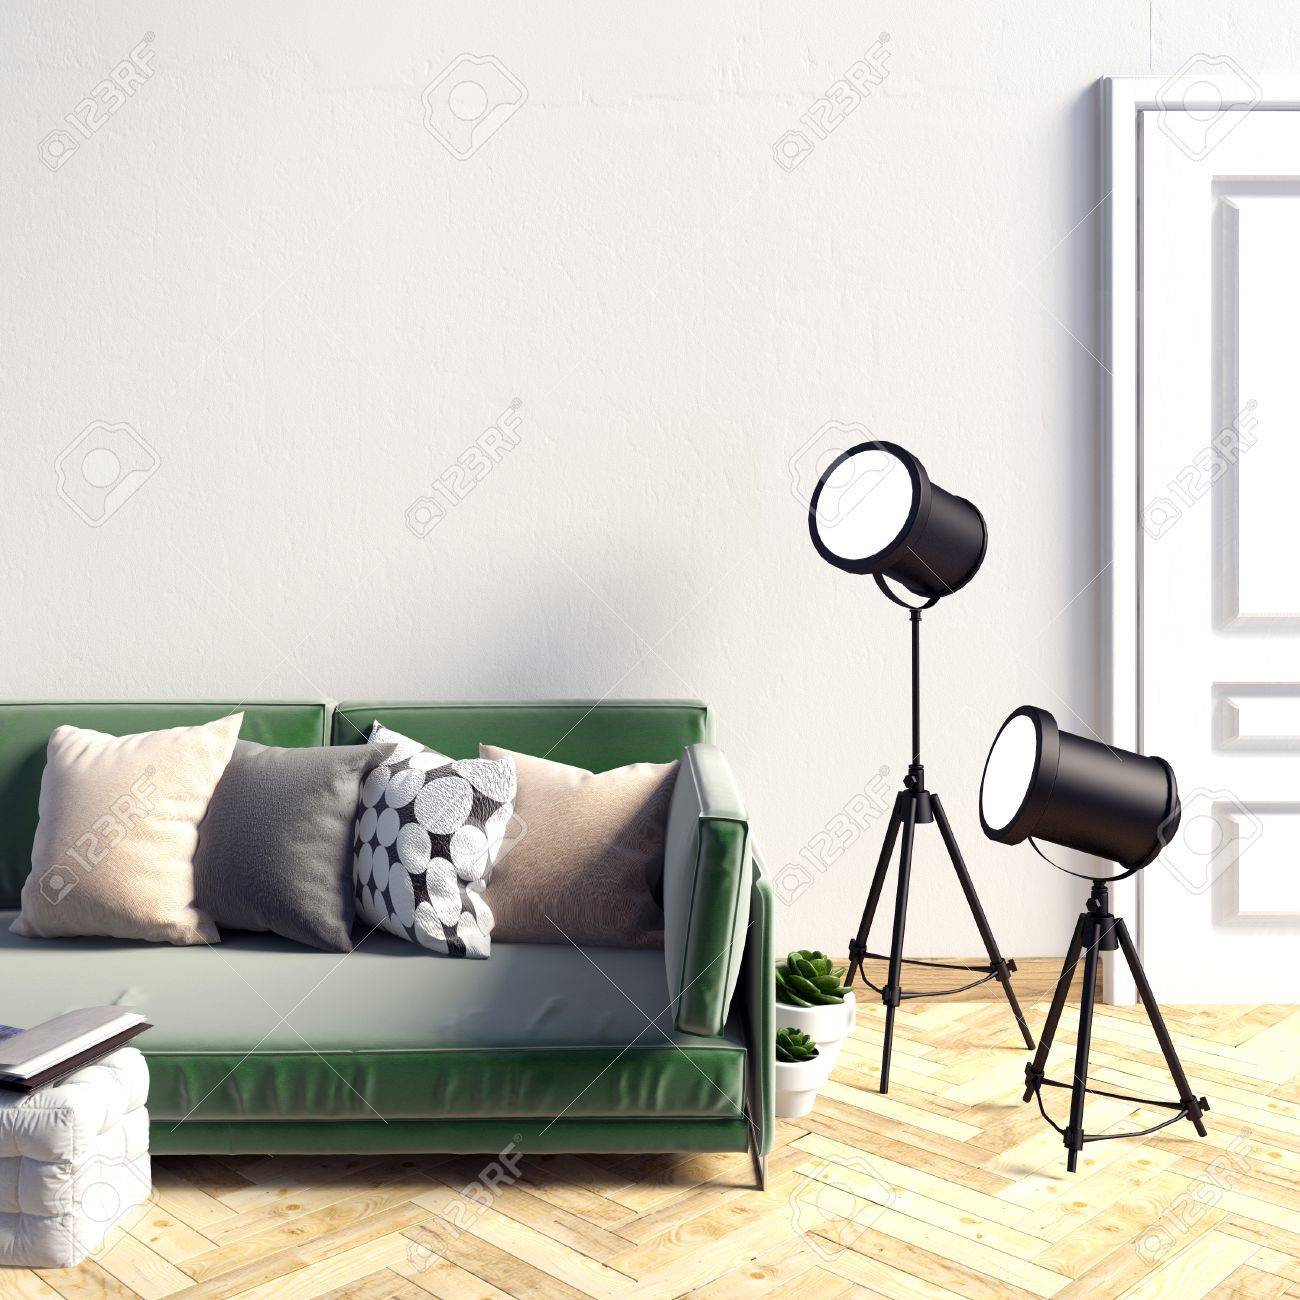 Fullsize Of Free Living Room Photos